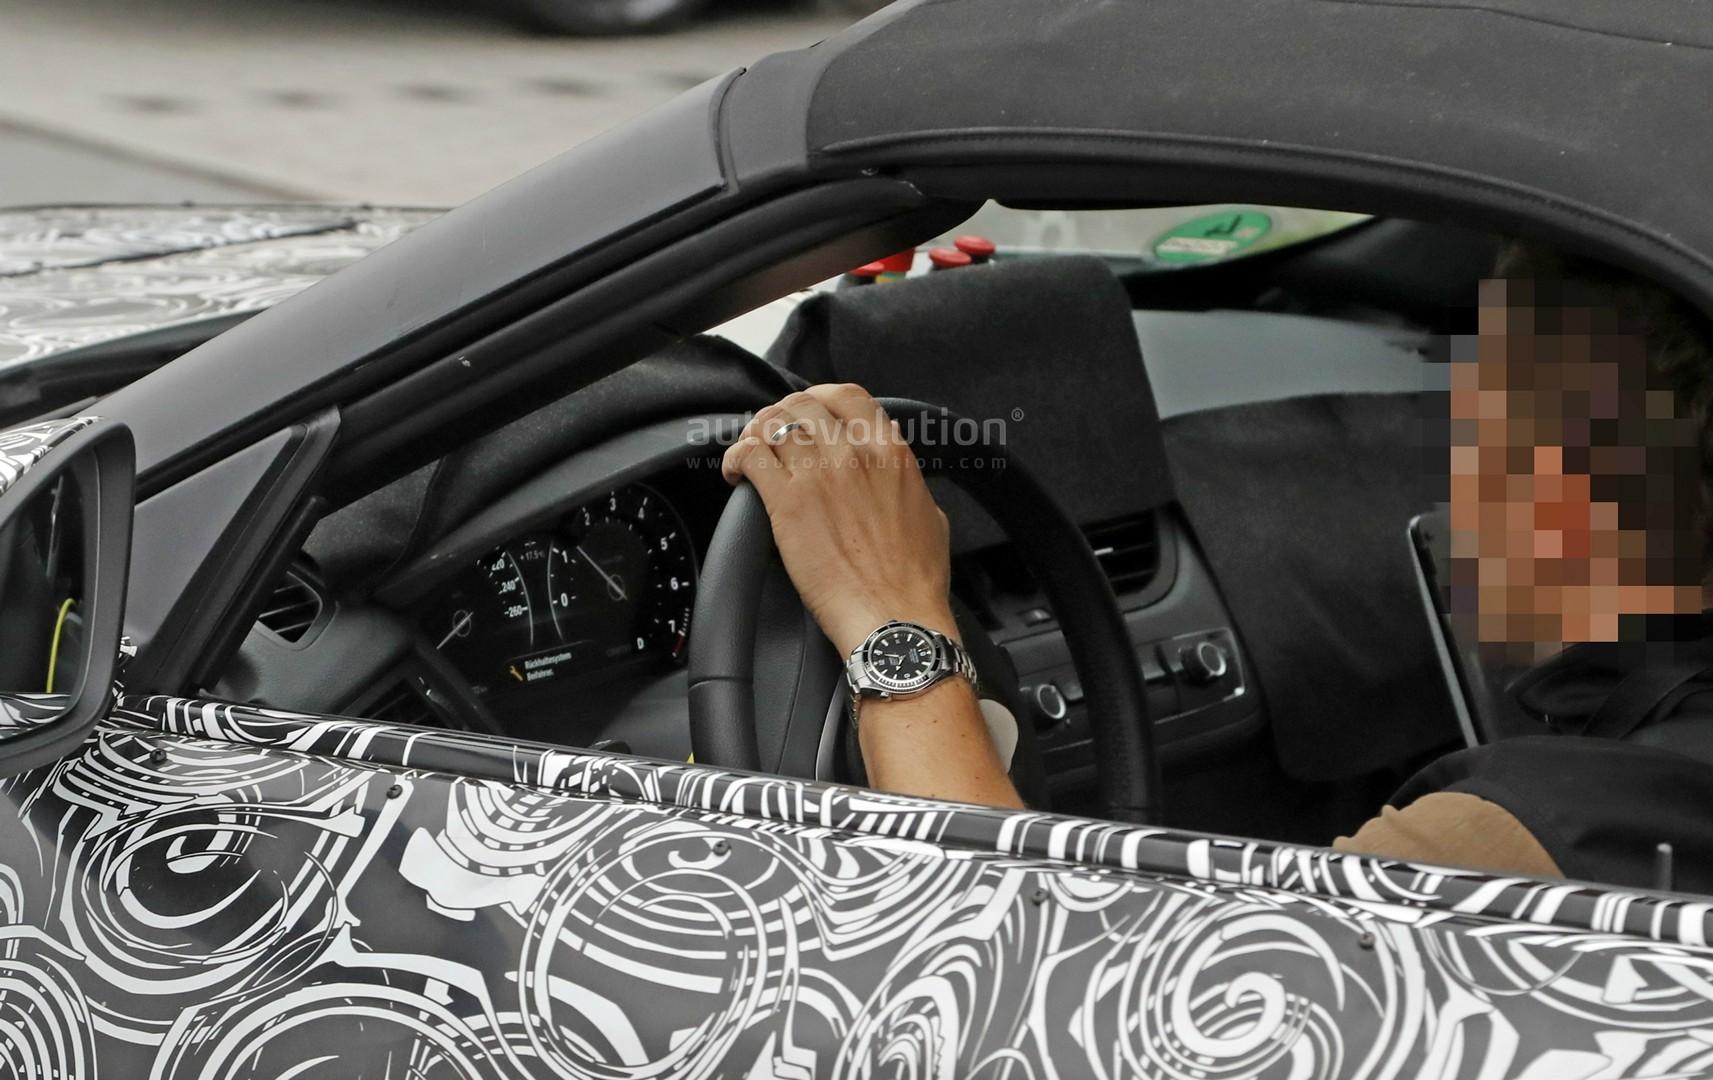 2018 Bmw Z5 Partially Reveals Interior During Nurburgring